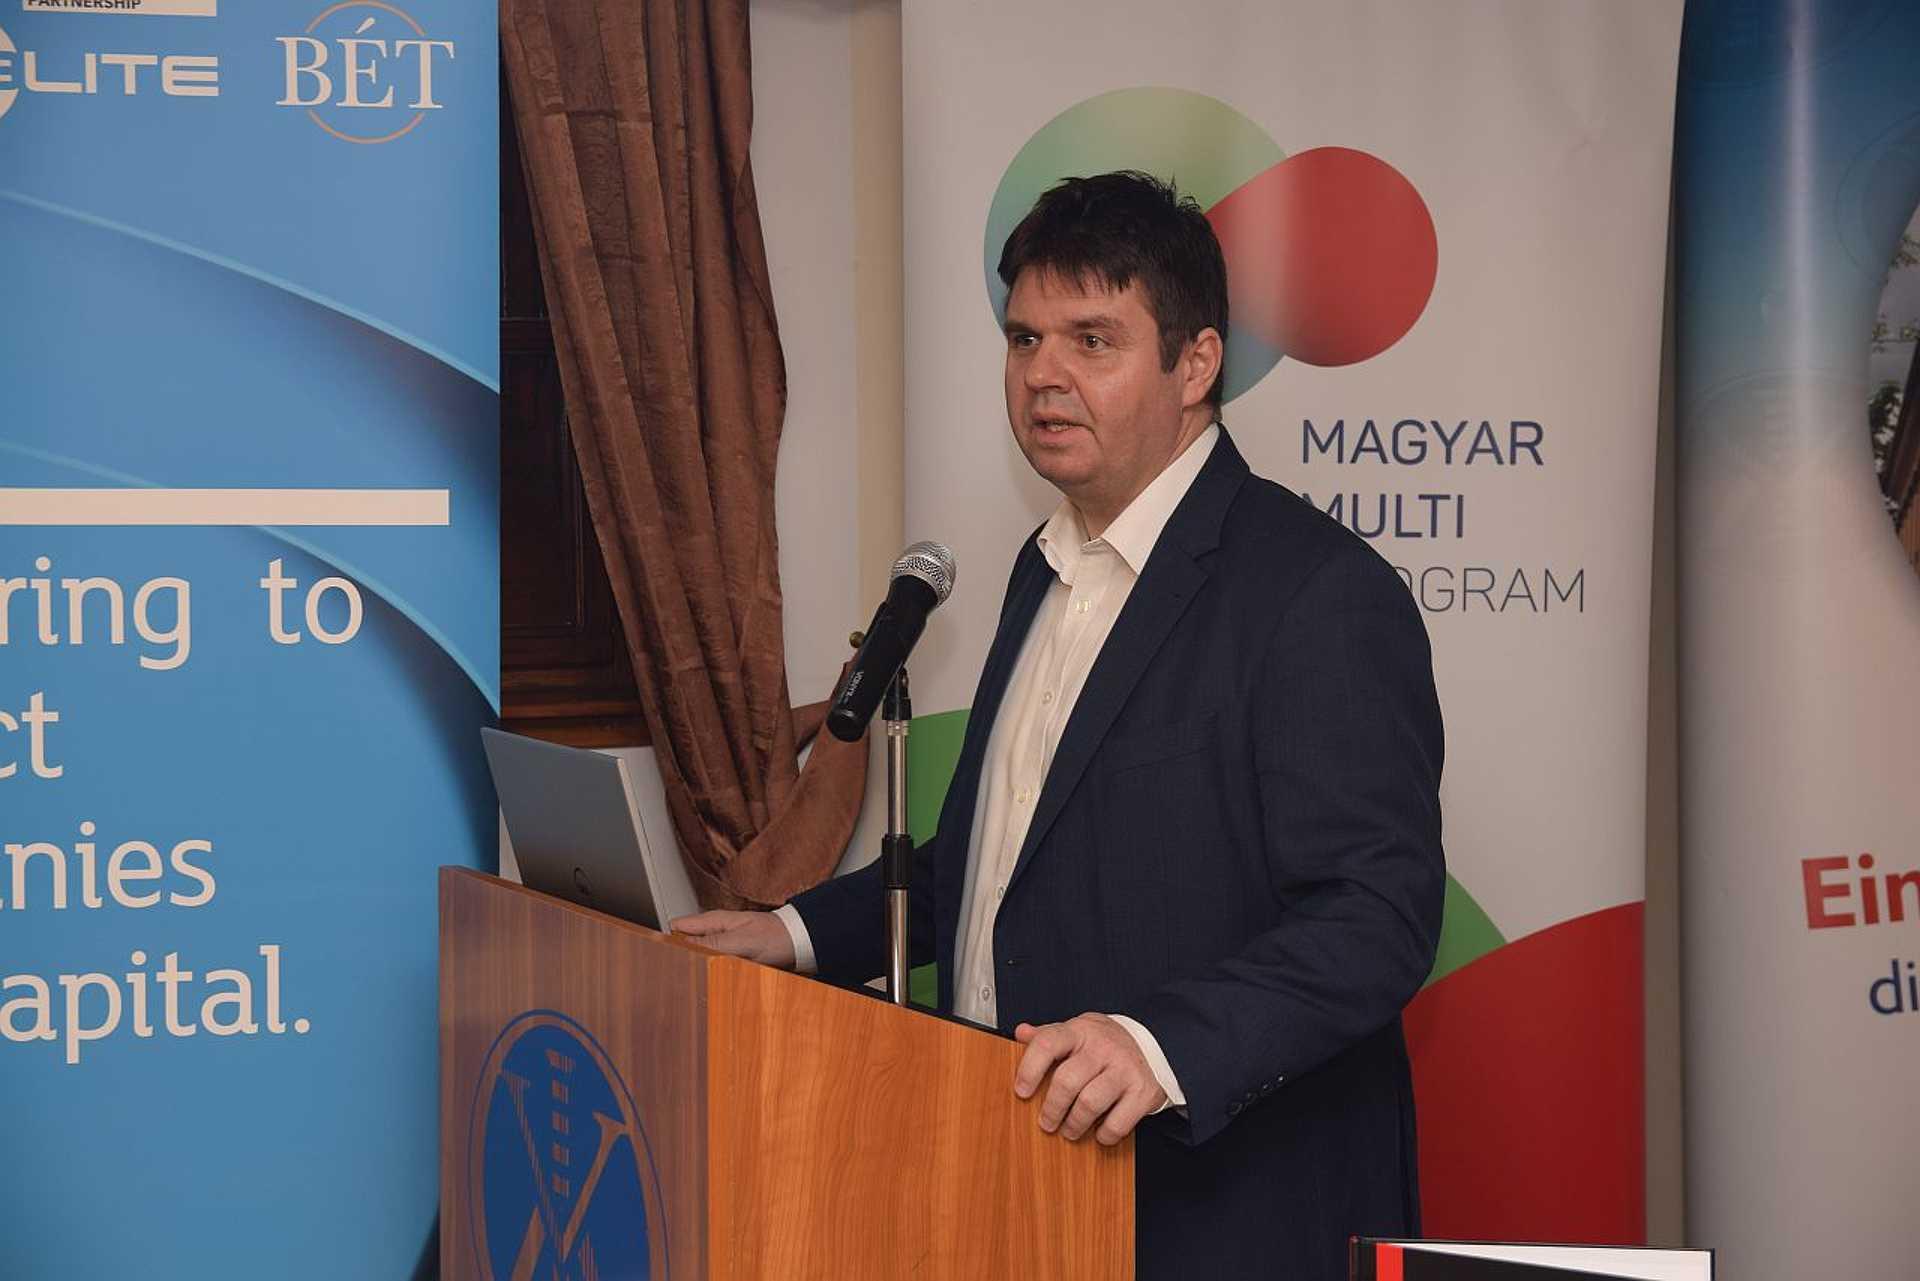 Magyar Multi Program (Szombathely, iparkamara)